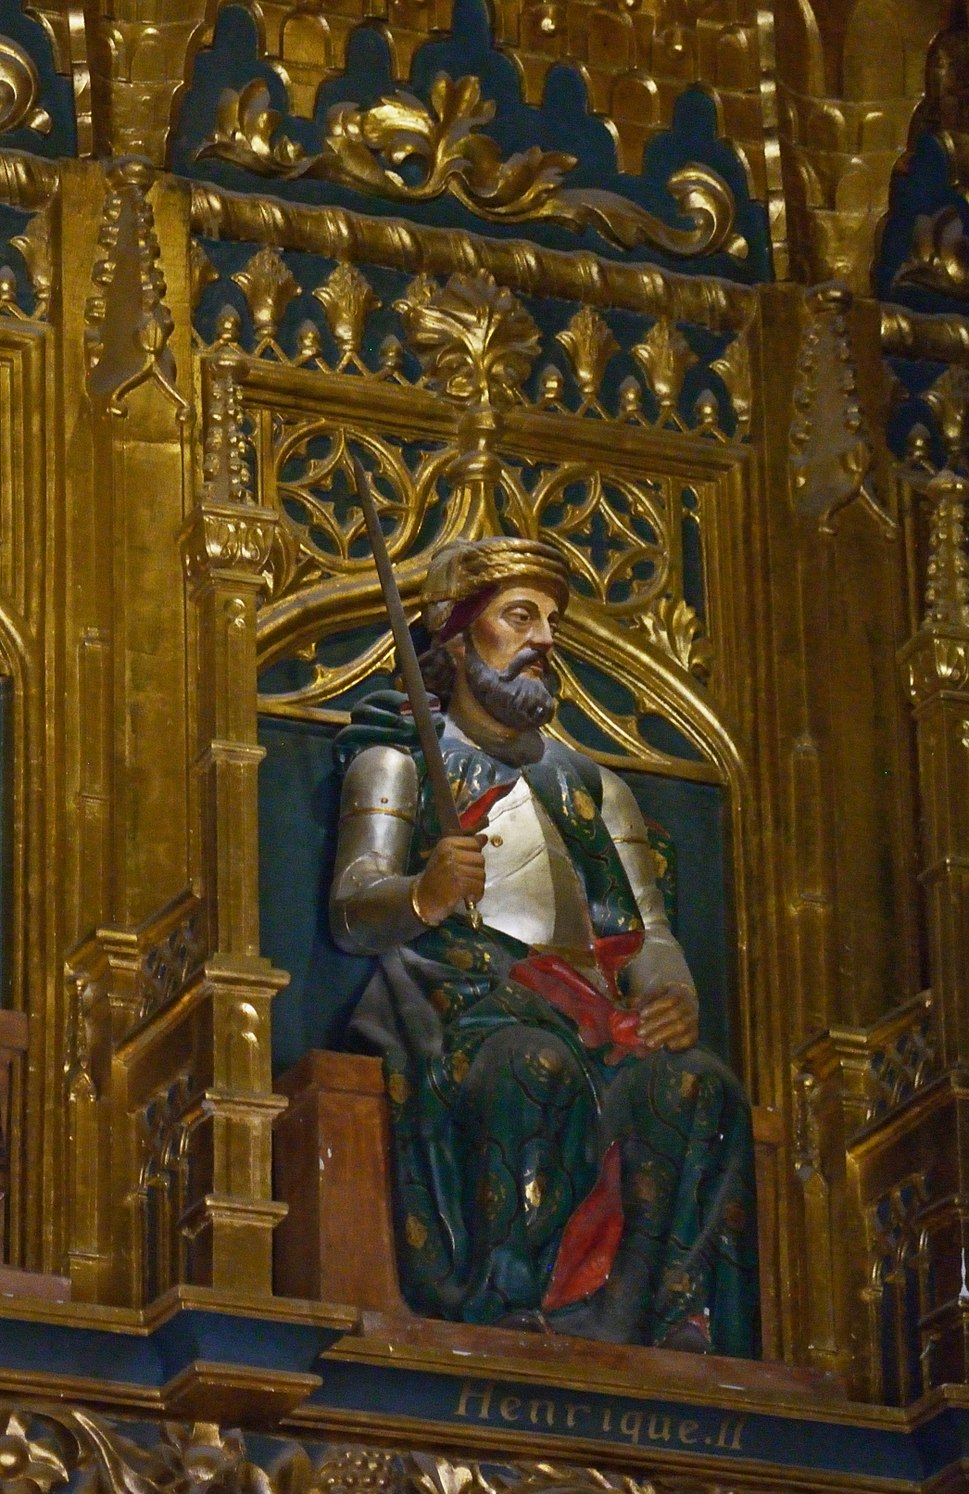 Image of the King Henry II of Castile (Enrique II de Castilla) in the Alcázar of Segovia